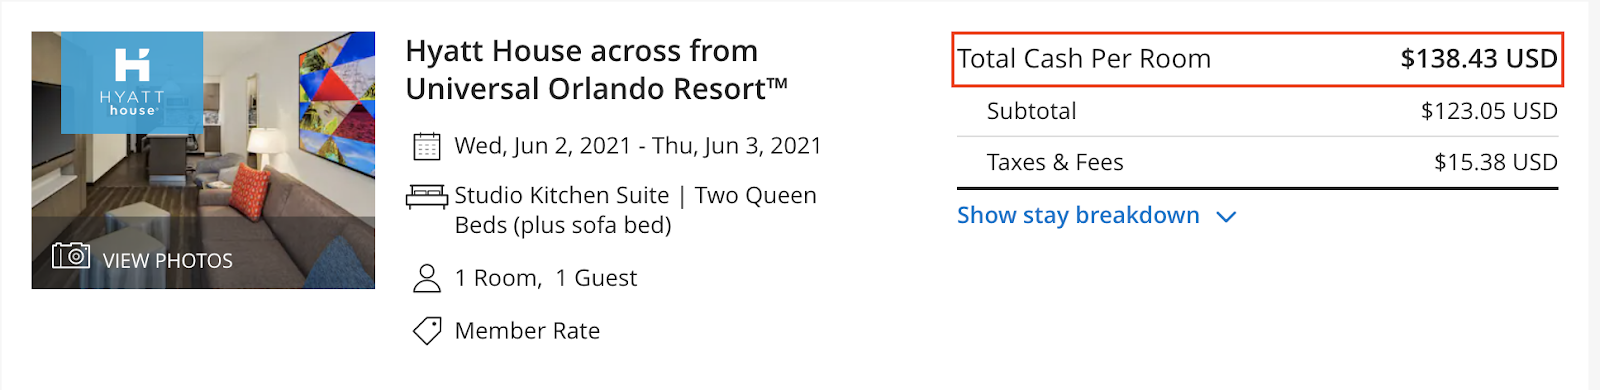 Chase Pay yourself back - Hyatt house across from Universal Orlando Resort